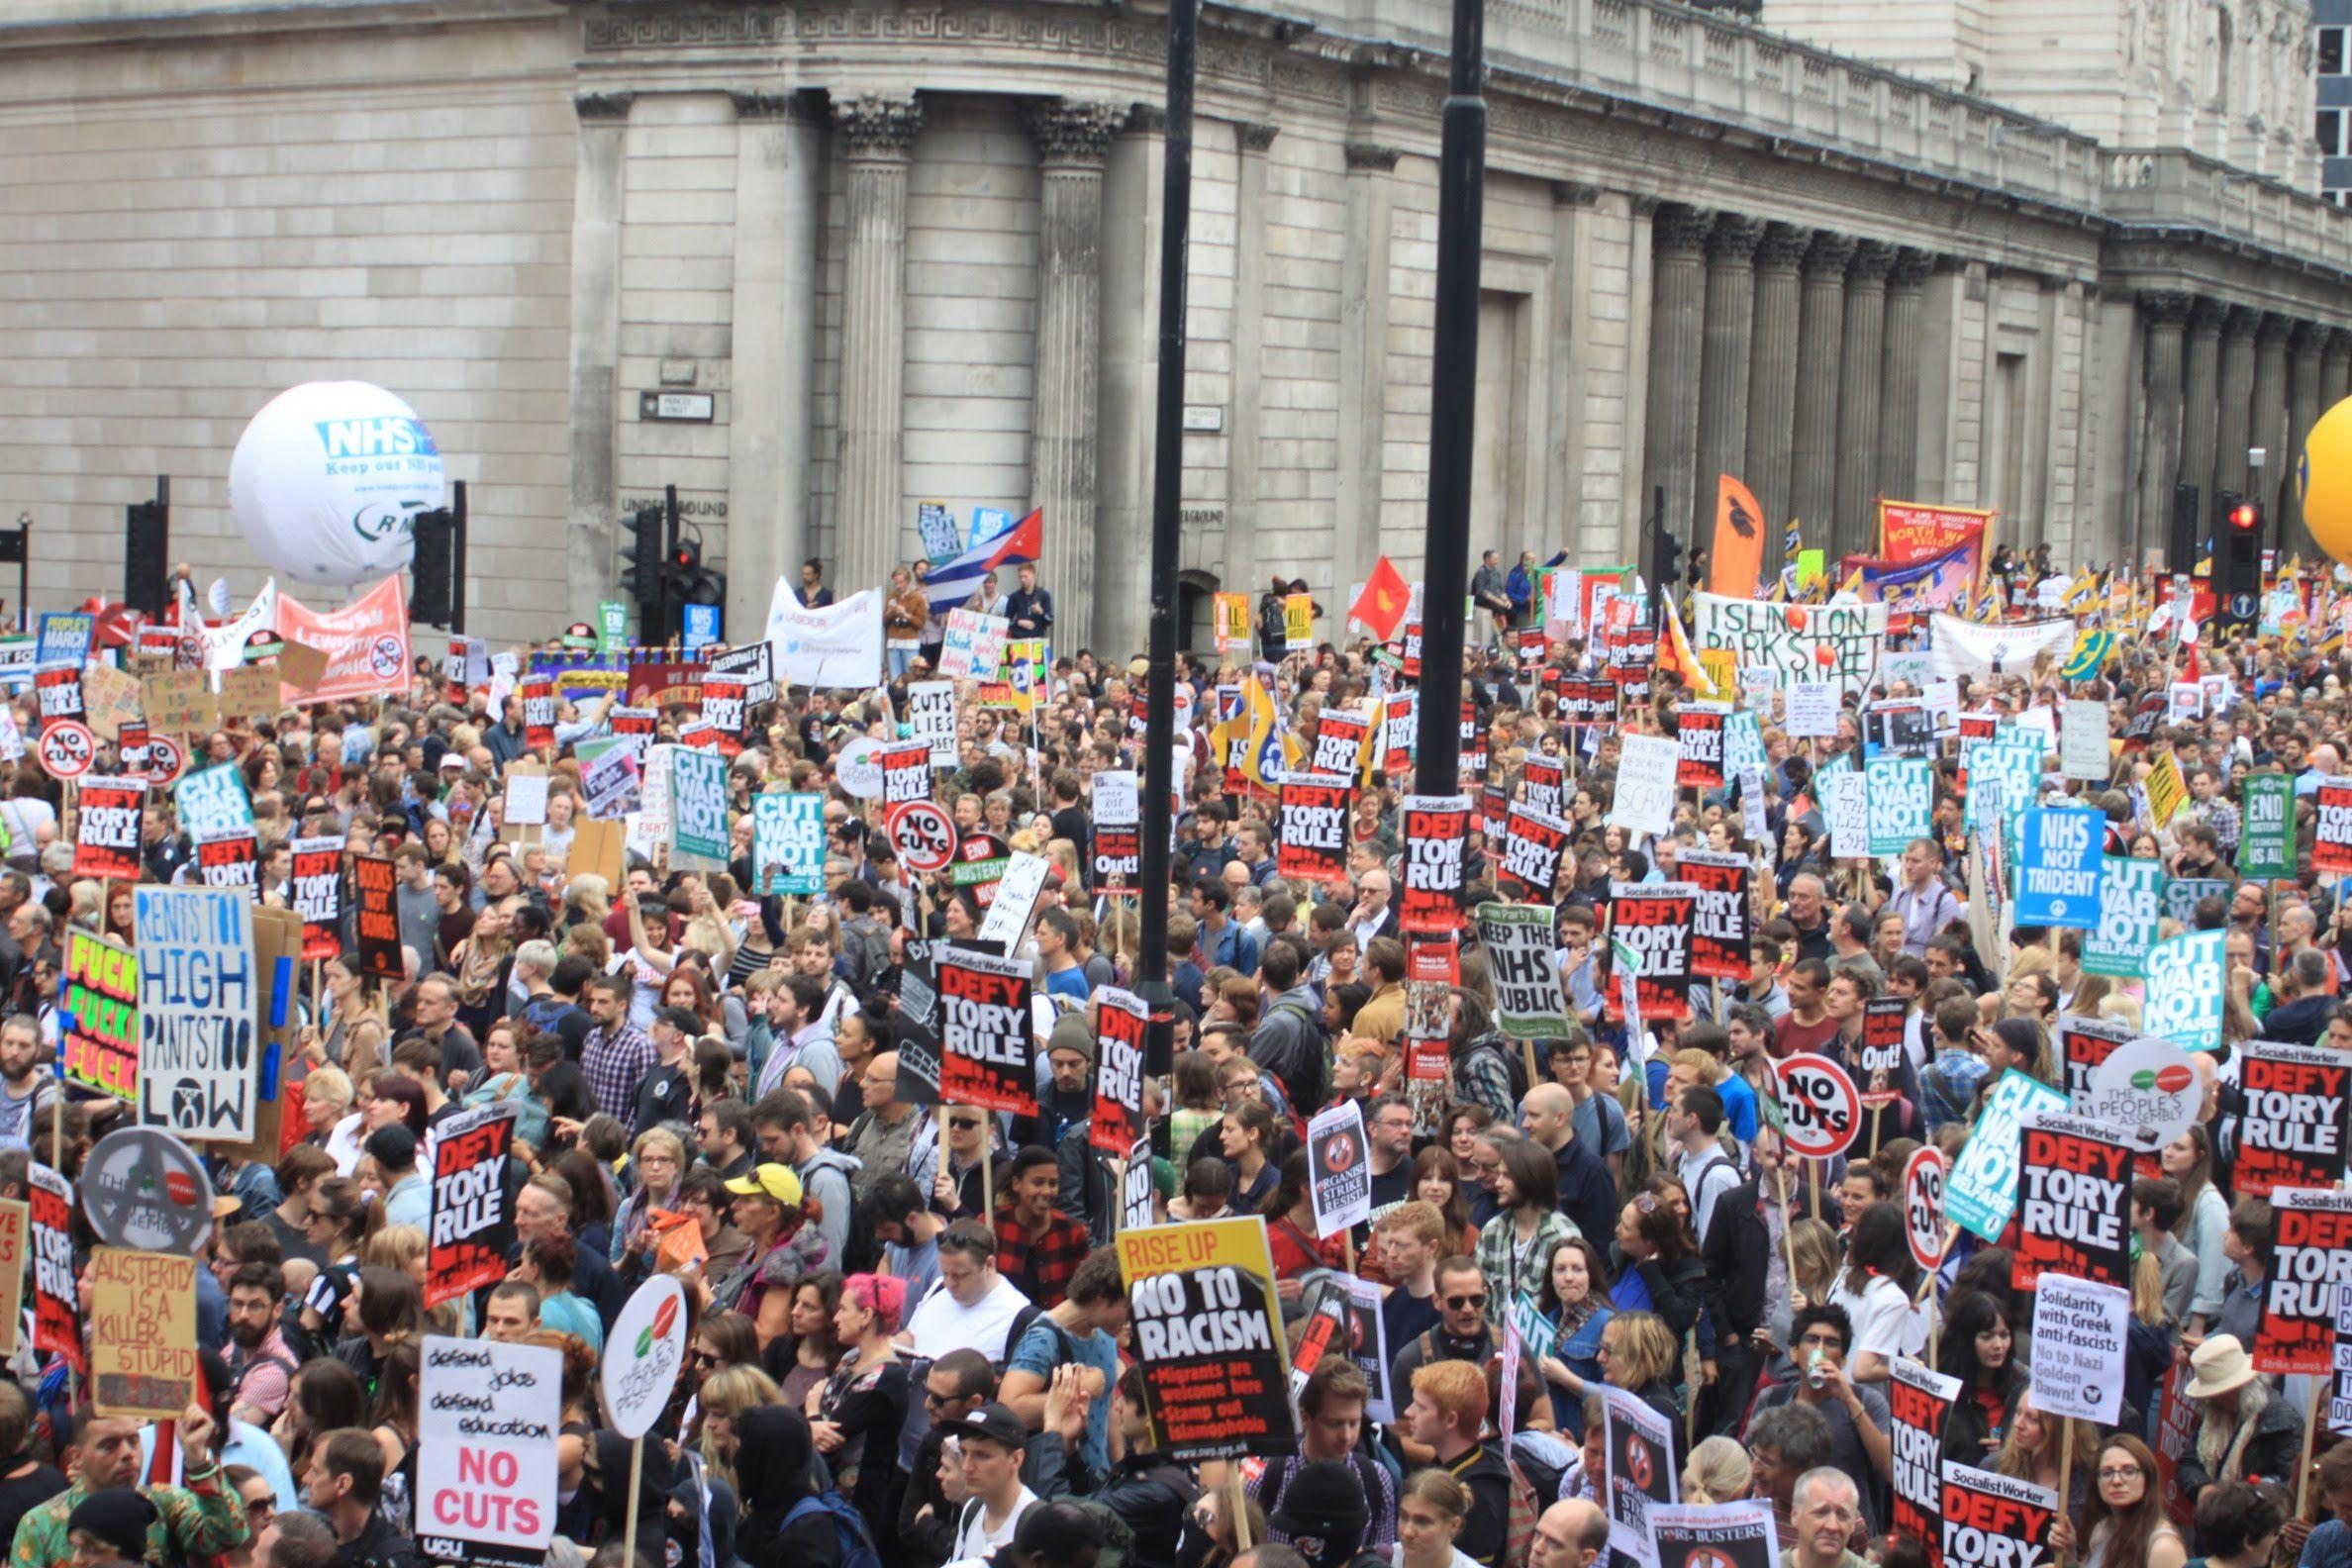 March Against Austerity London 250 000 People London Protest London London Street